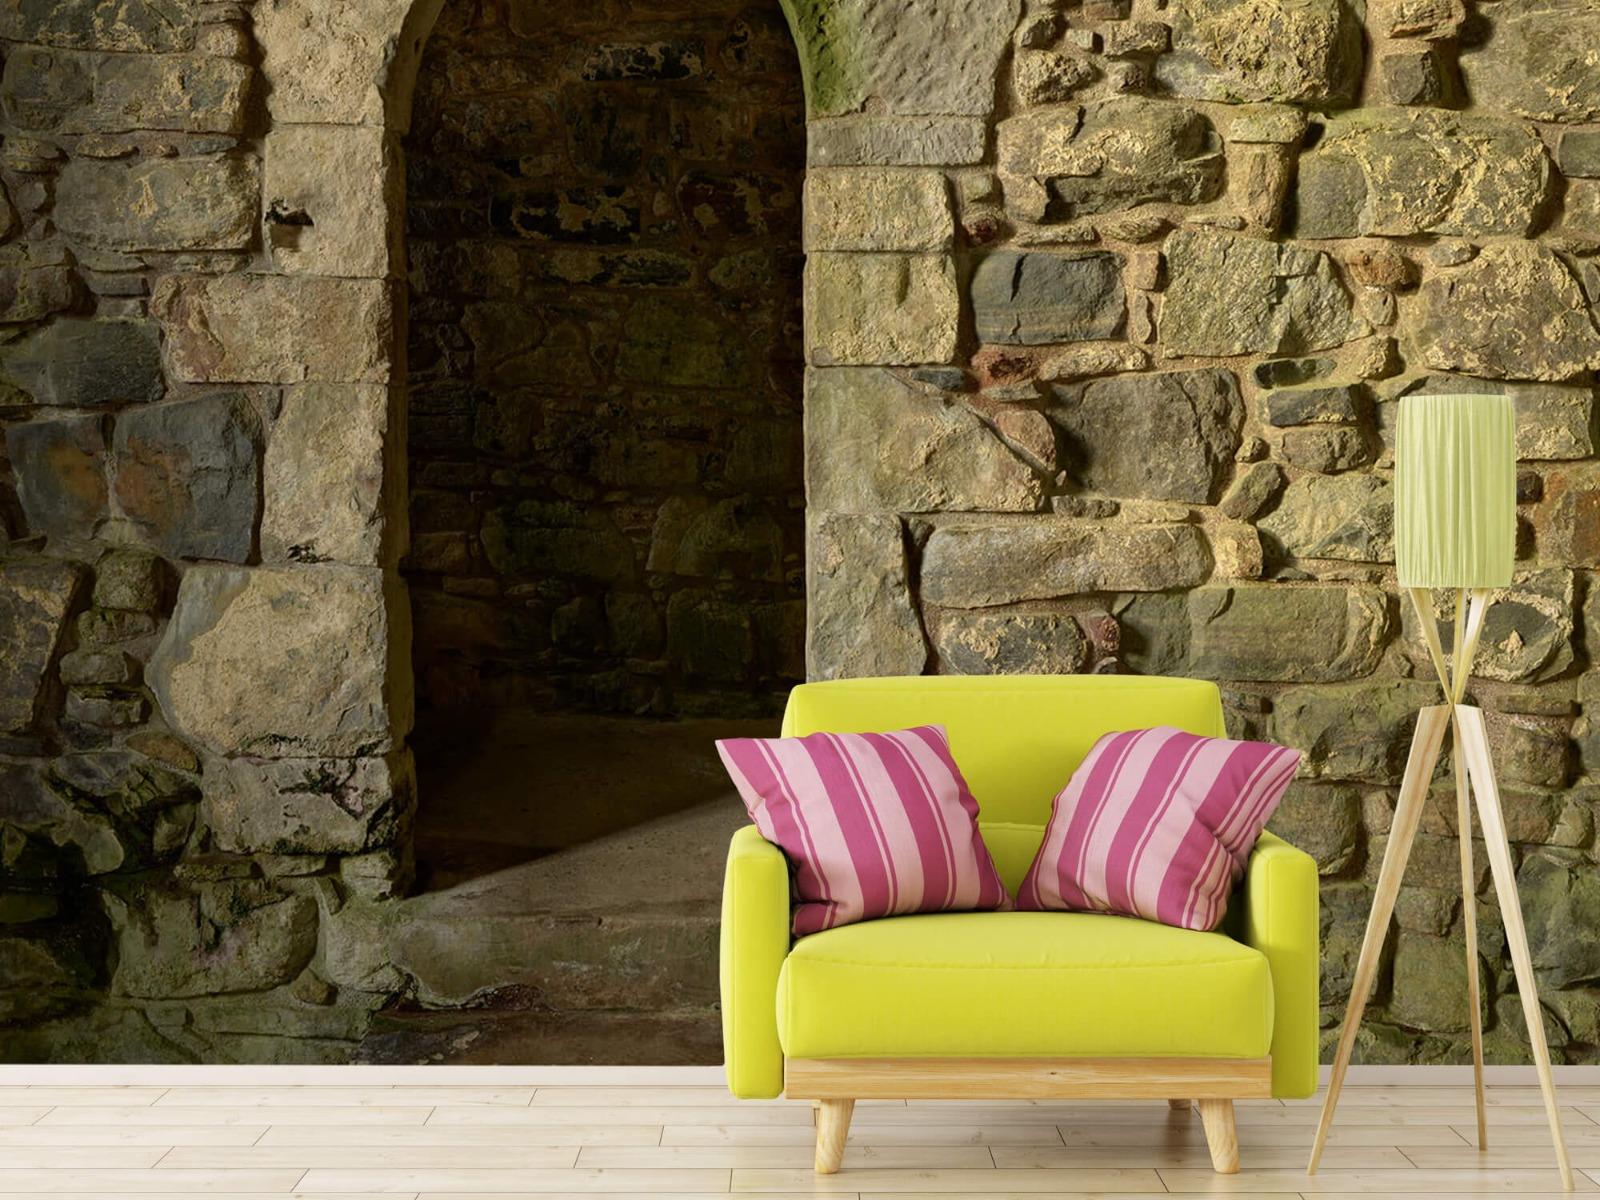 Steen behang - Oude muur met doorgang - Slaapkamer 17